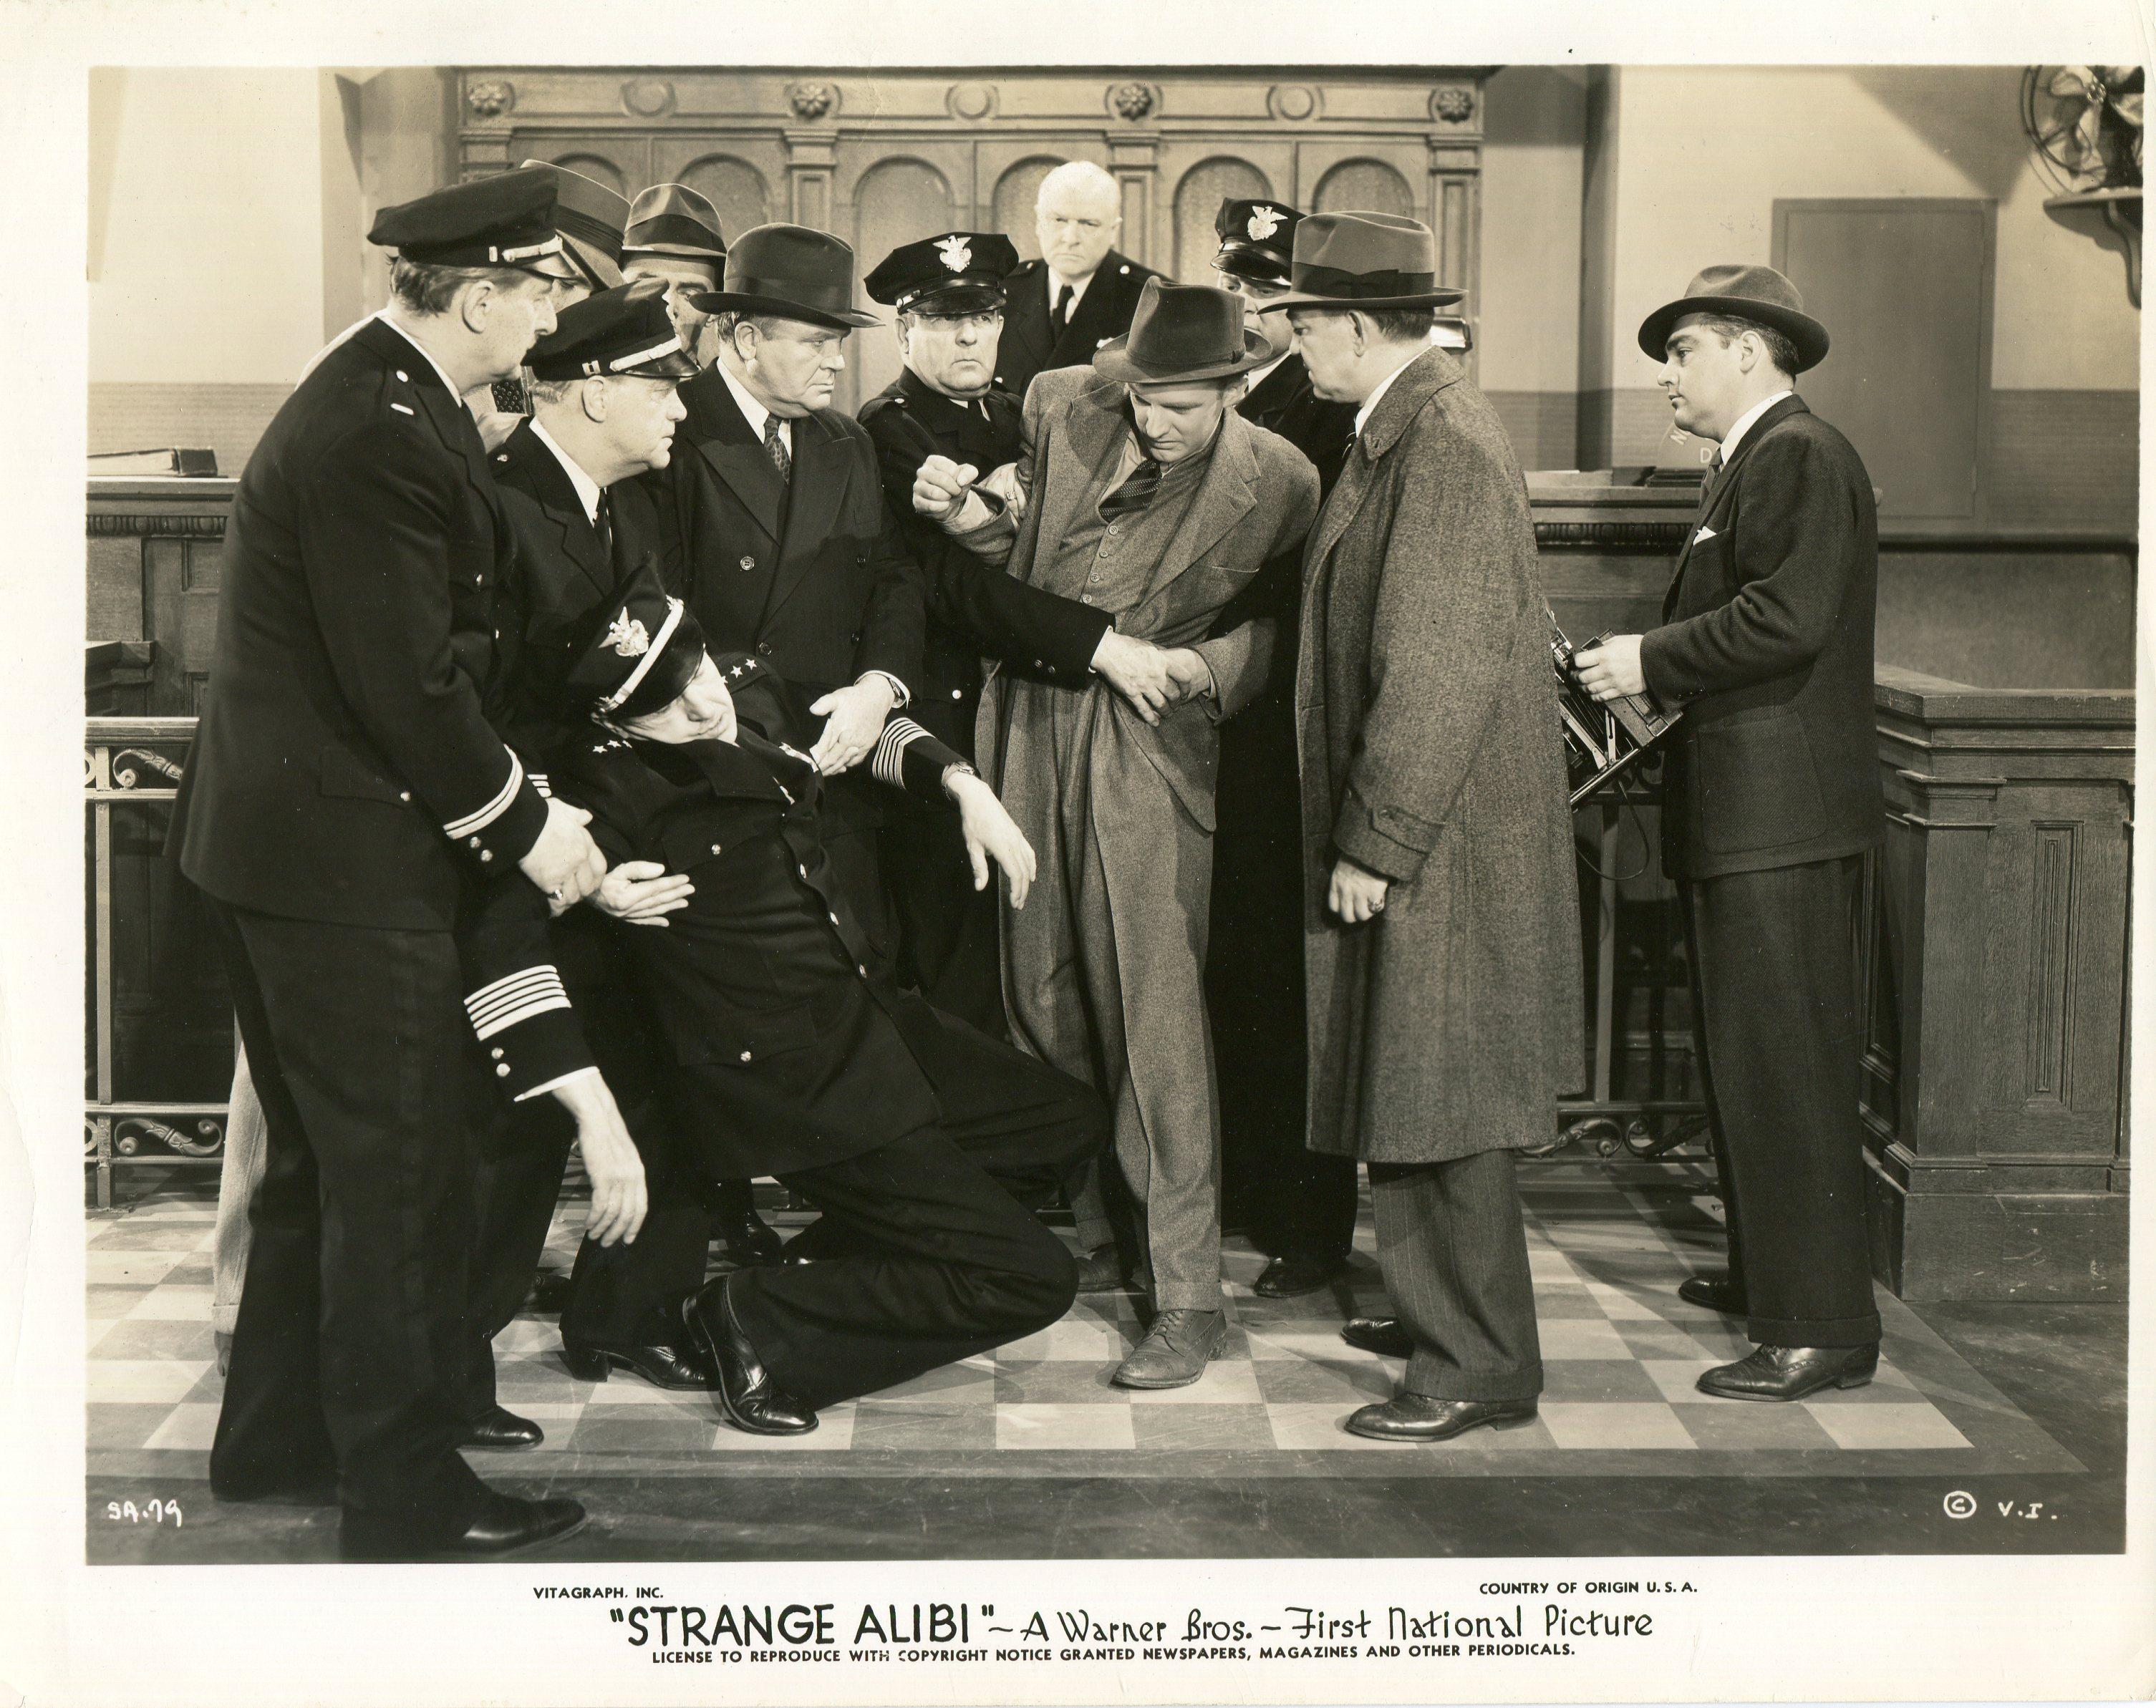 Stanley Andrews, Wade Boteler, Cliff Clark, Arthur Kennedy, Frank Wilcox, and Charles C. Wilson in Strange Alibi (1941)